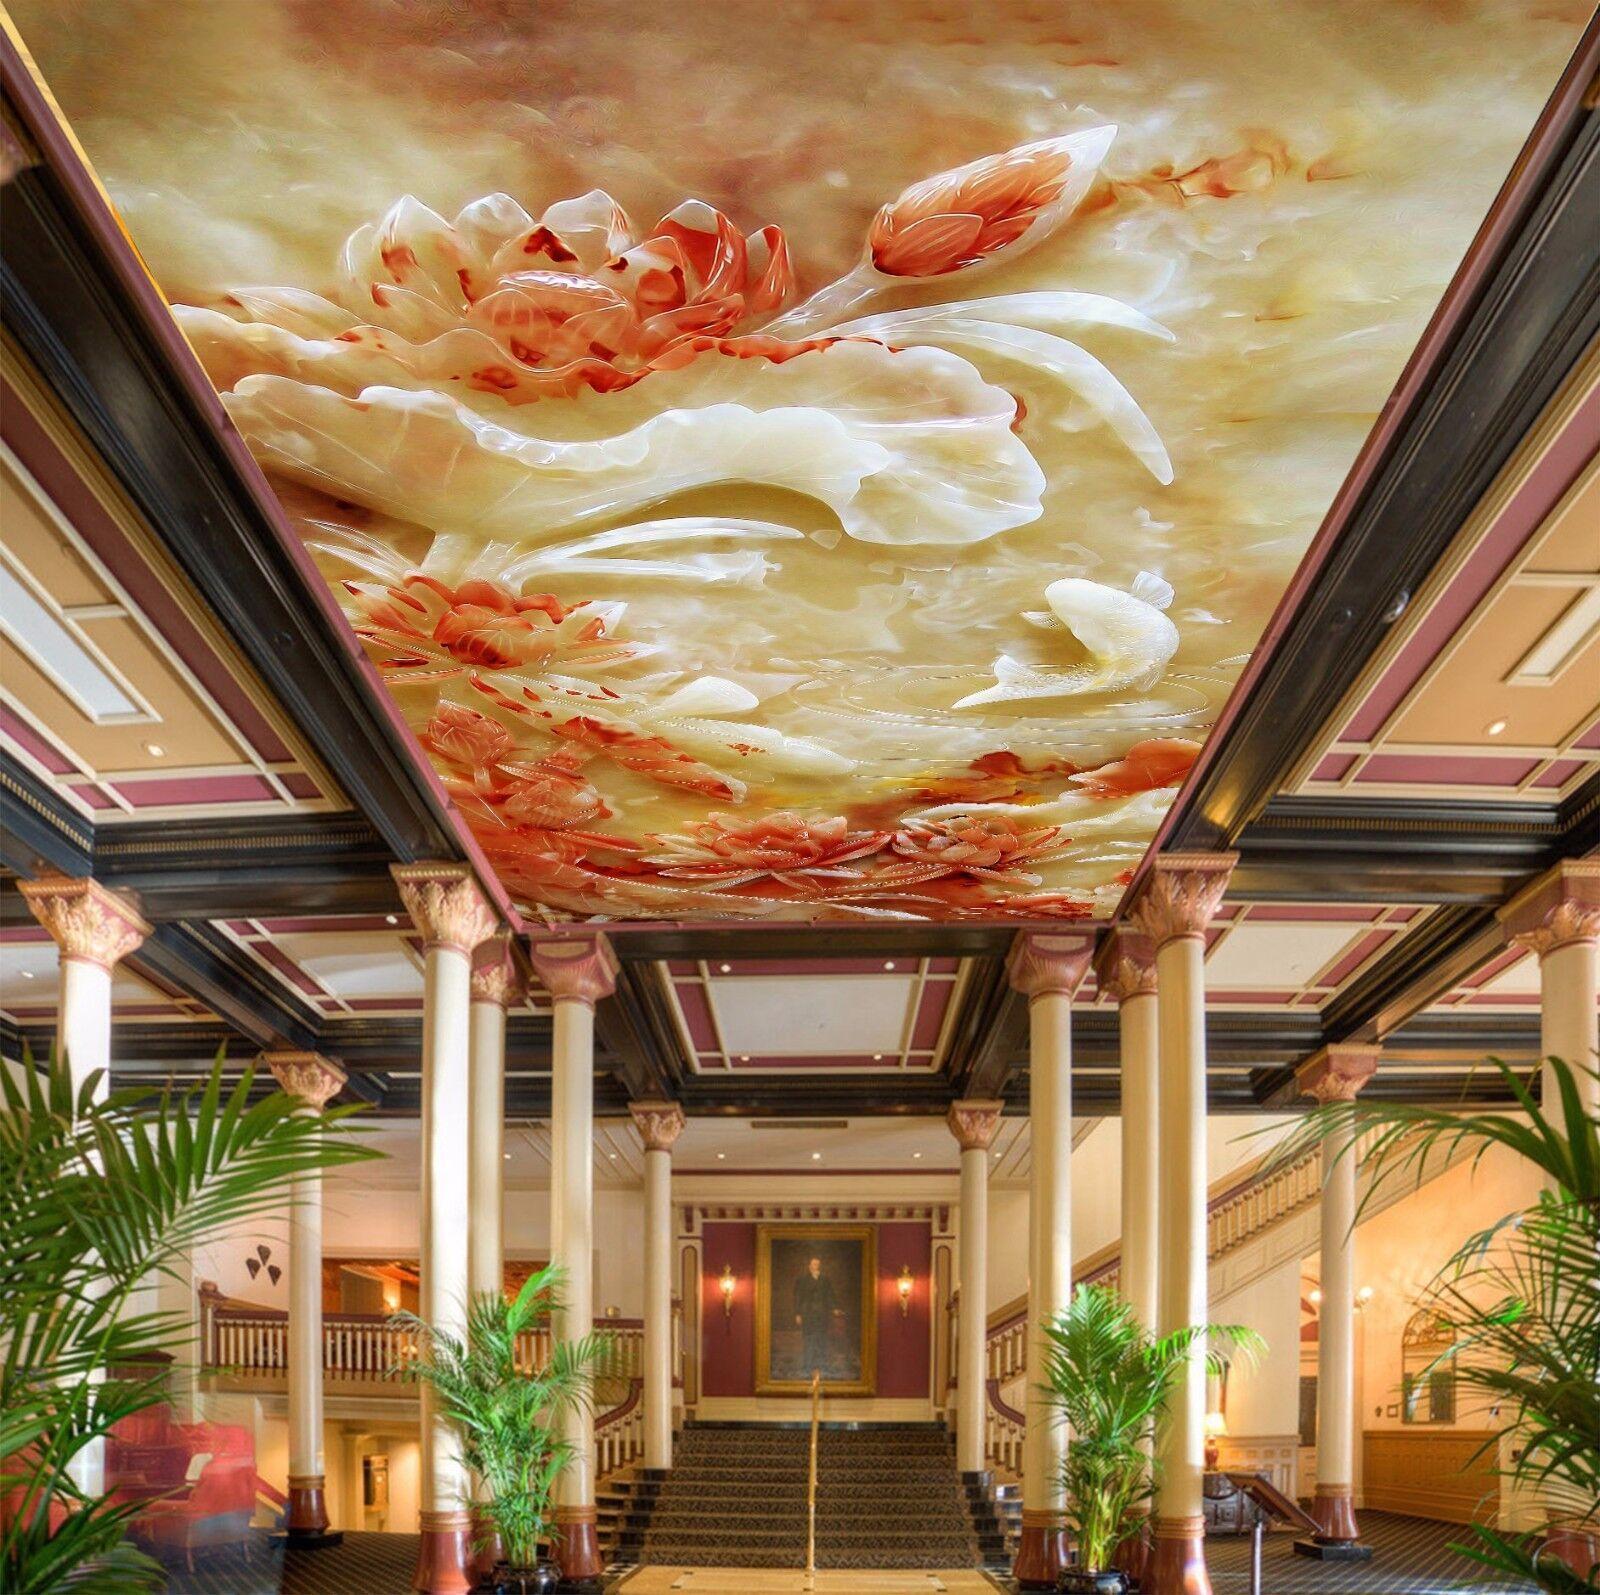 3D Jade Carving Lotus Pond 5 Ceiling Wall Paper Print Wall Indoor Wall Murals CA